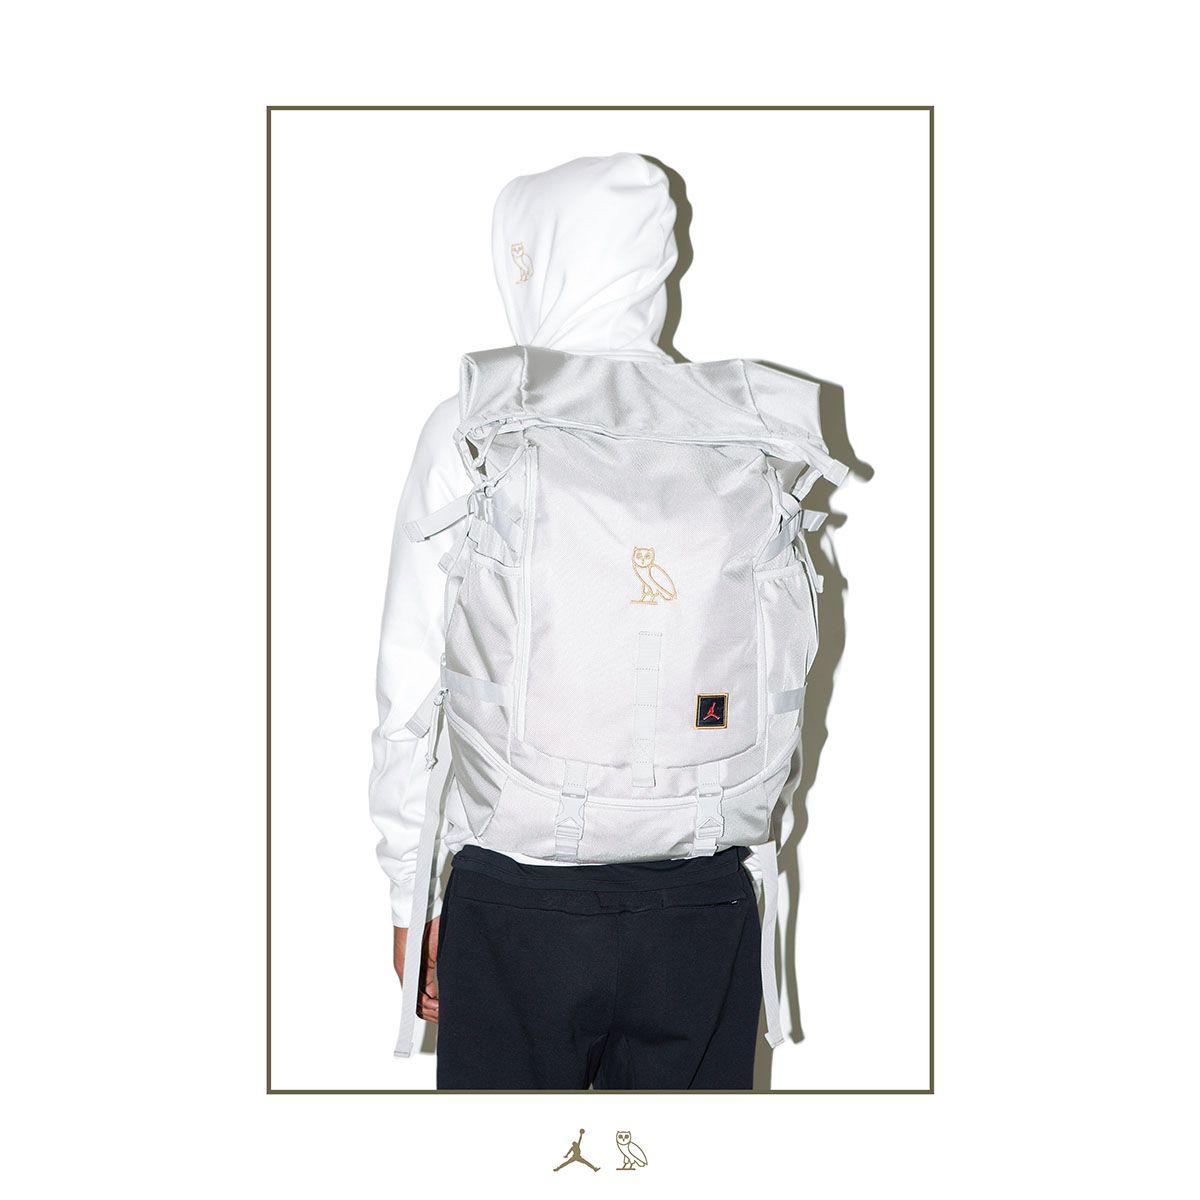 932965e631ea16 Jordan x OVO  Holiday 2016 Collection Lookbook - EU Kicks  Sneaker Magazine